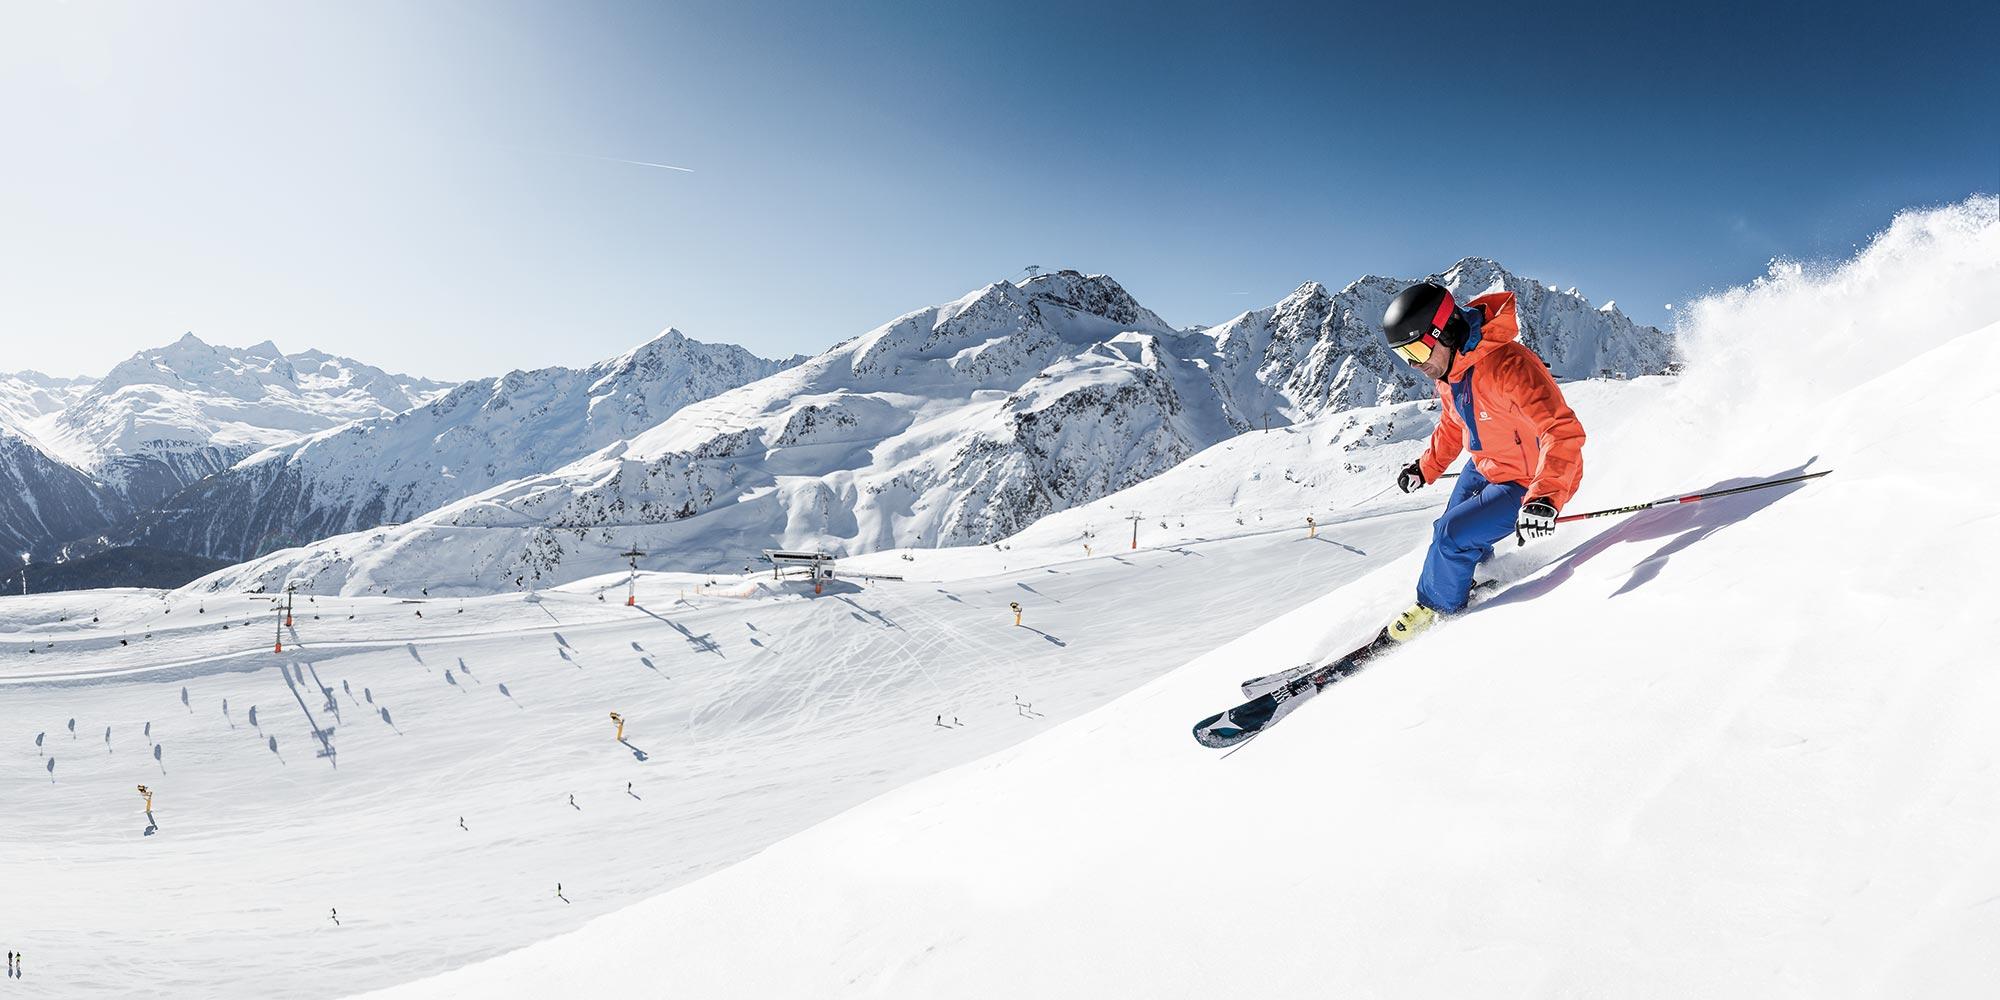 soel_skifahren_80_16_2000x1000